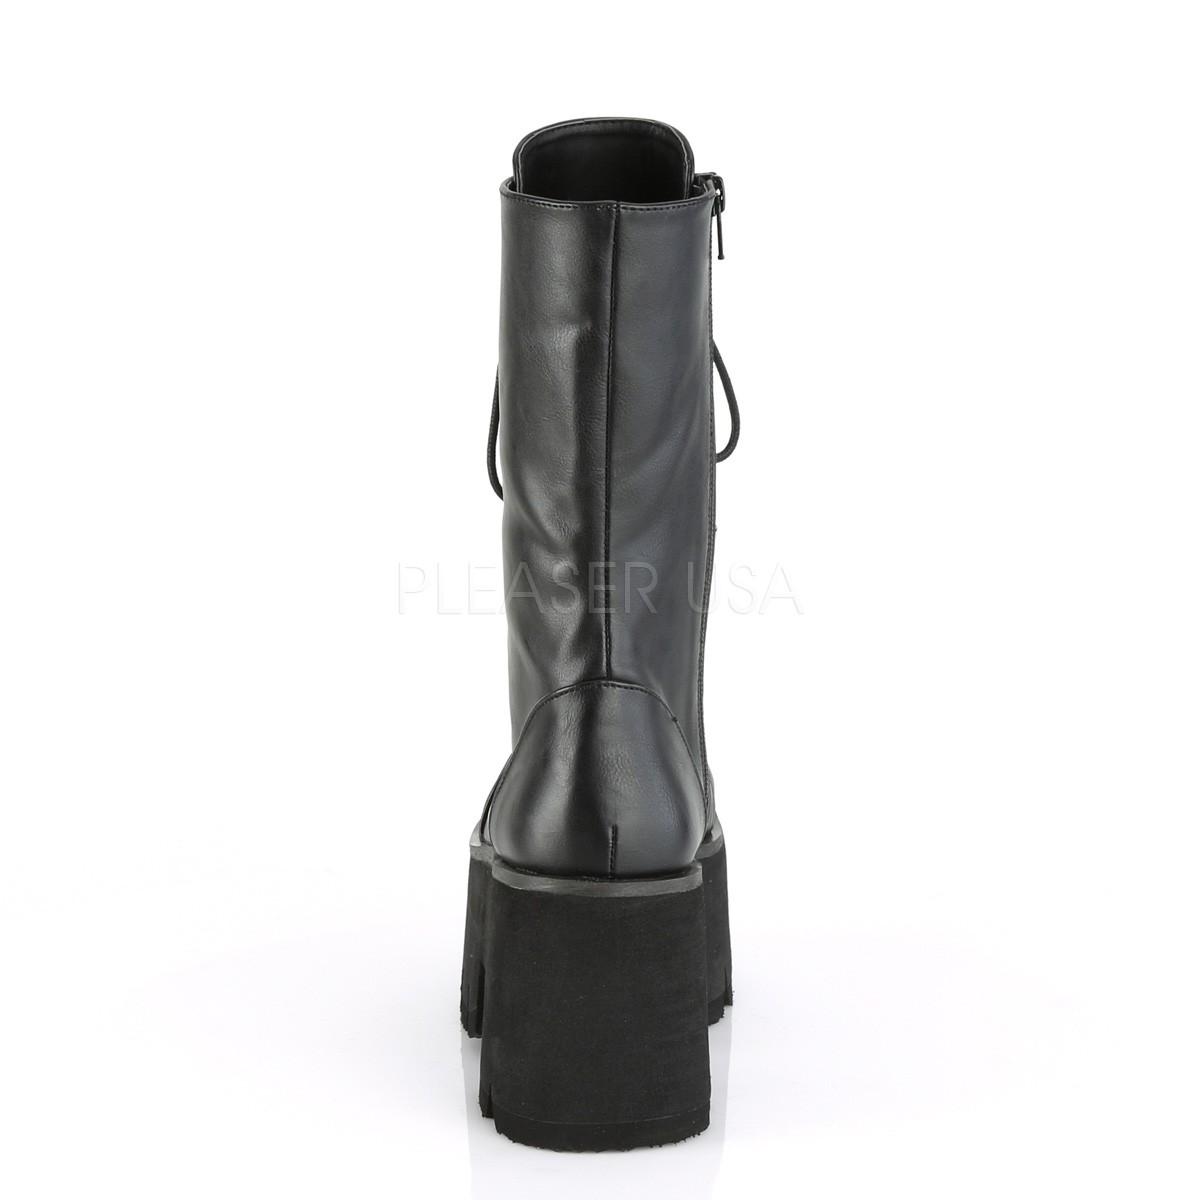 20cef9ec4b80 Vegan 9 cm Demonia ASHES-105 goth platform boots